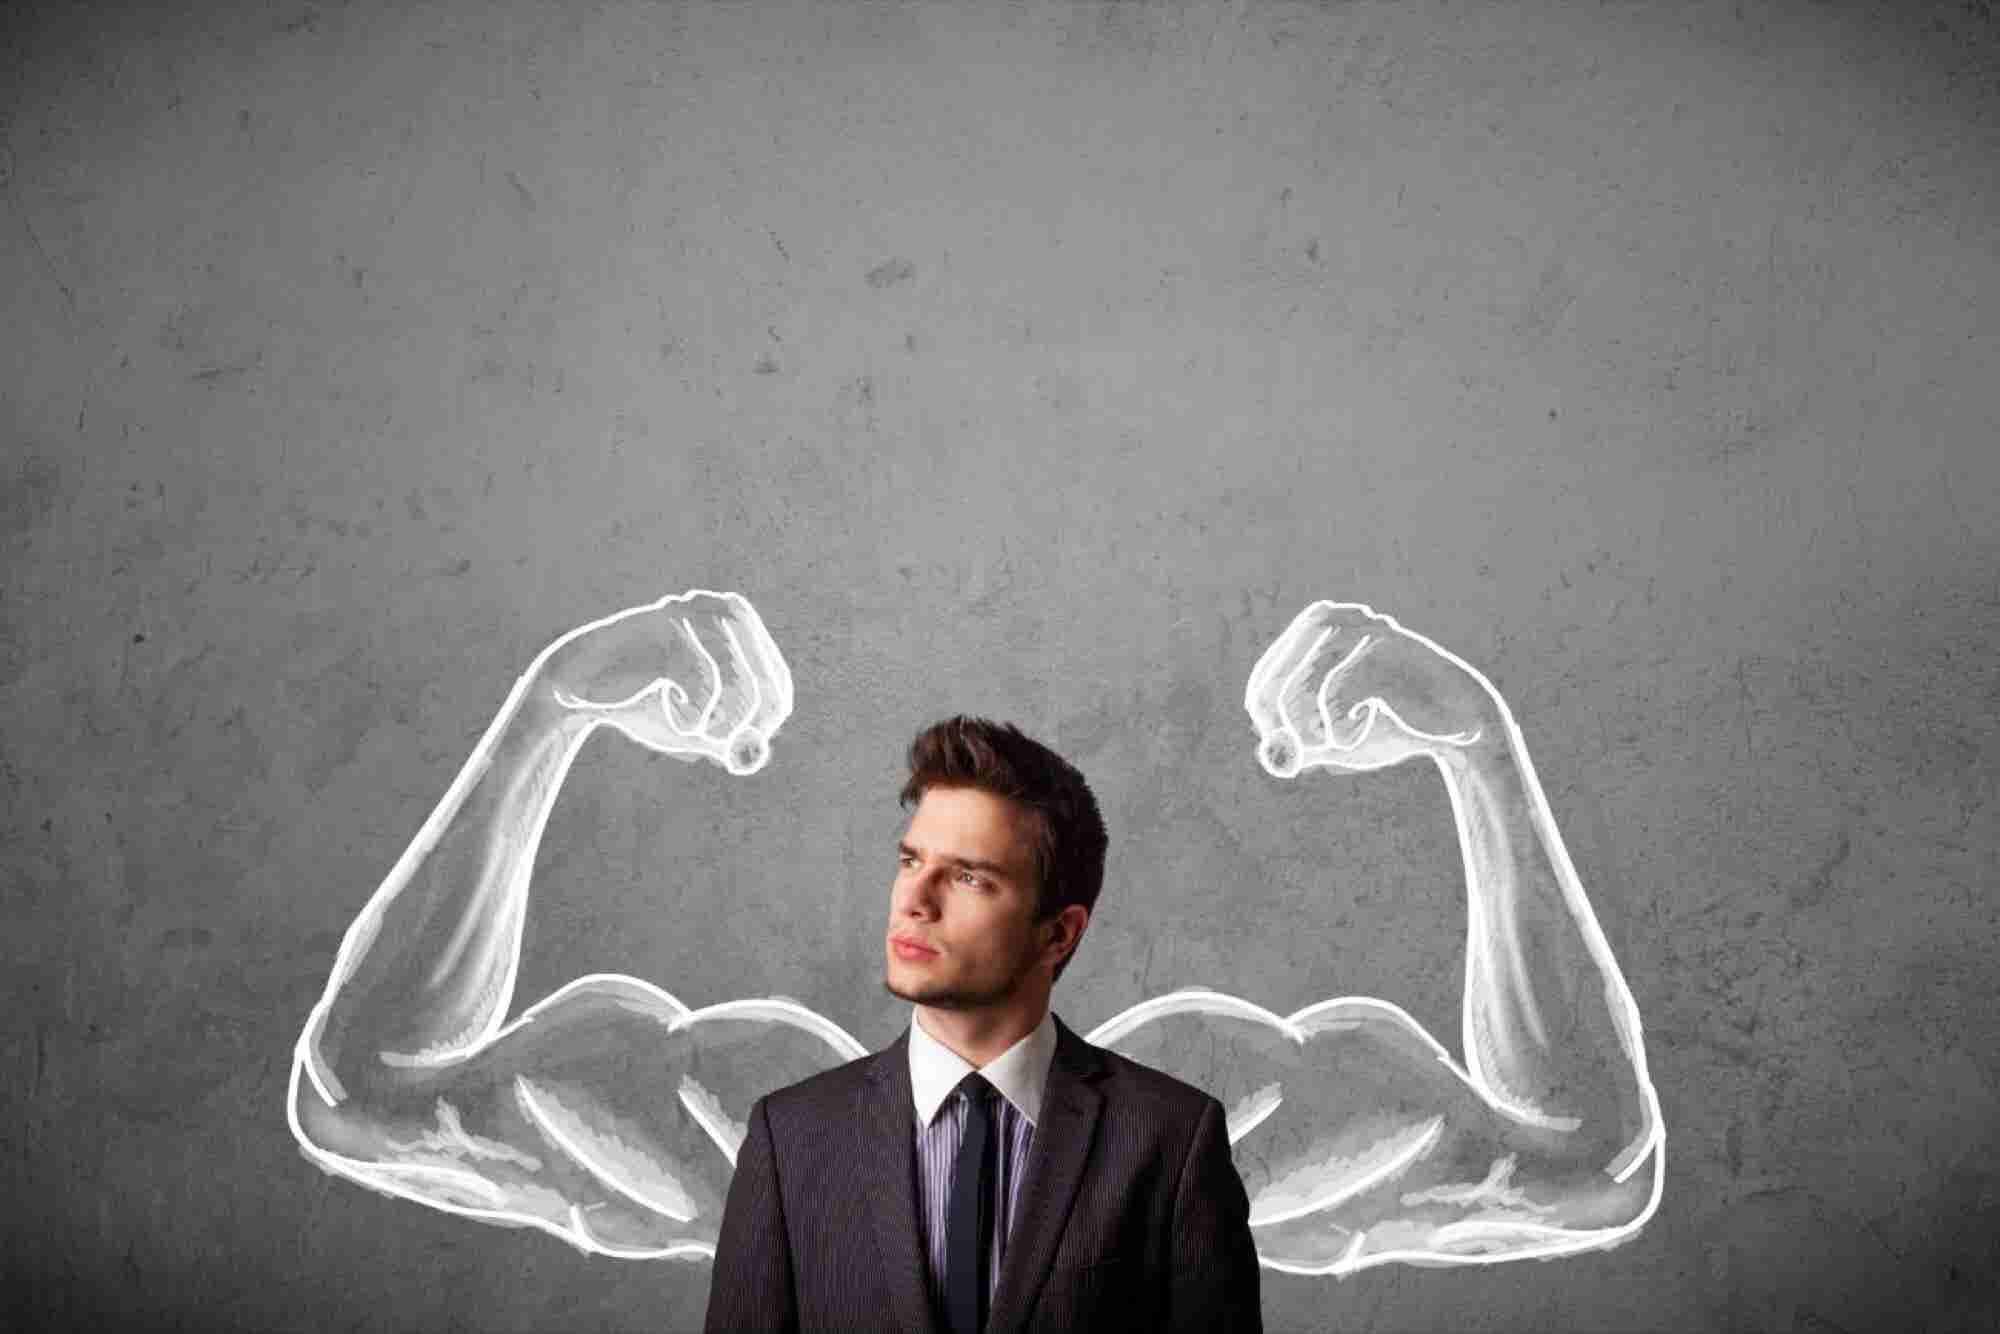 5 secretos para tener éxito duradero